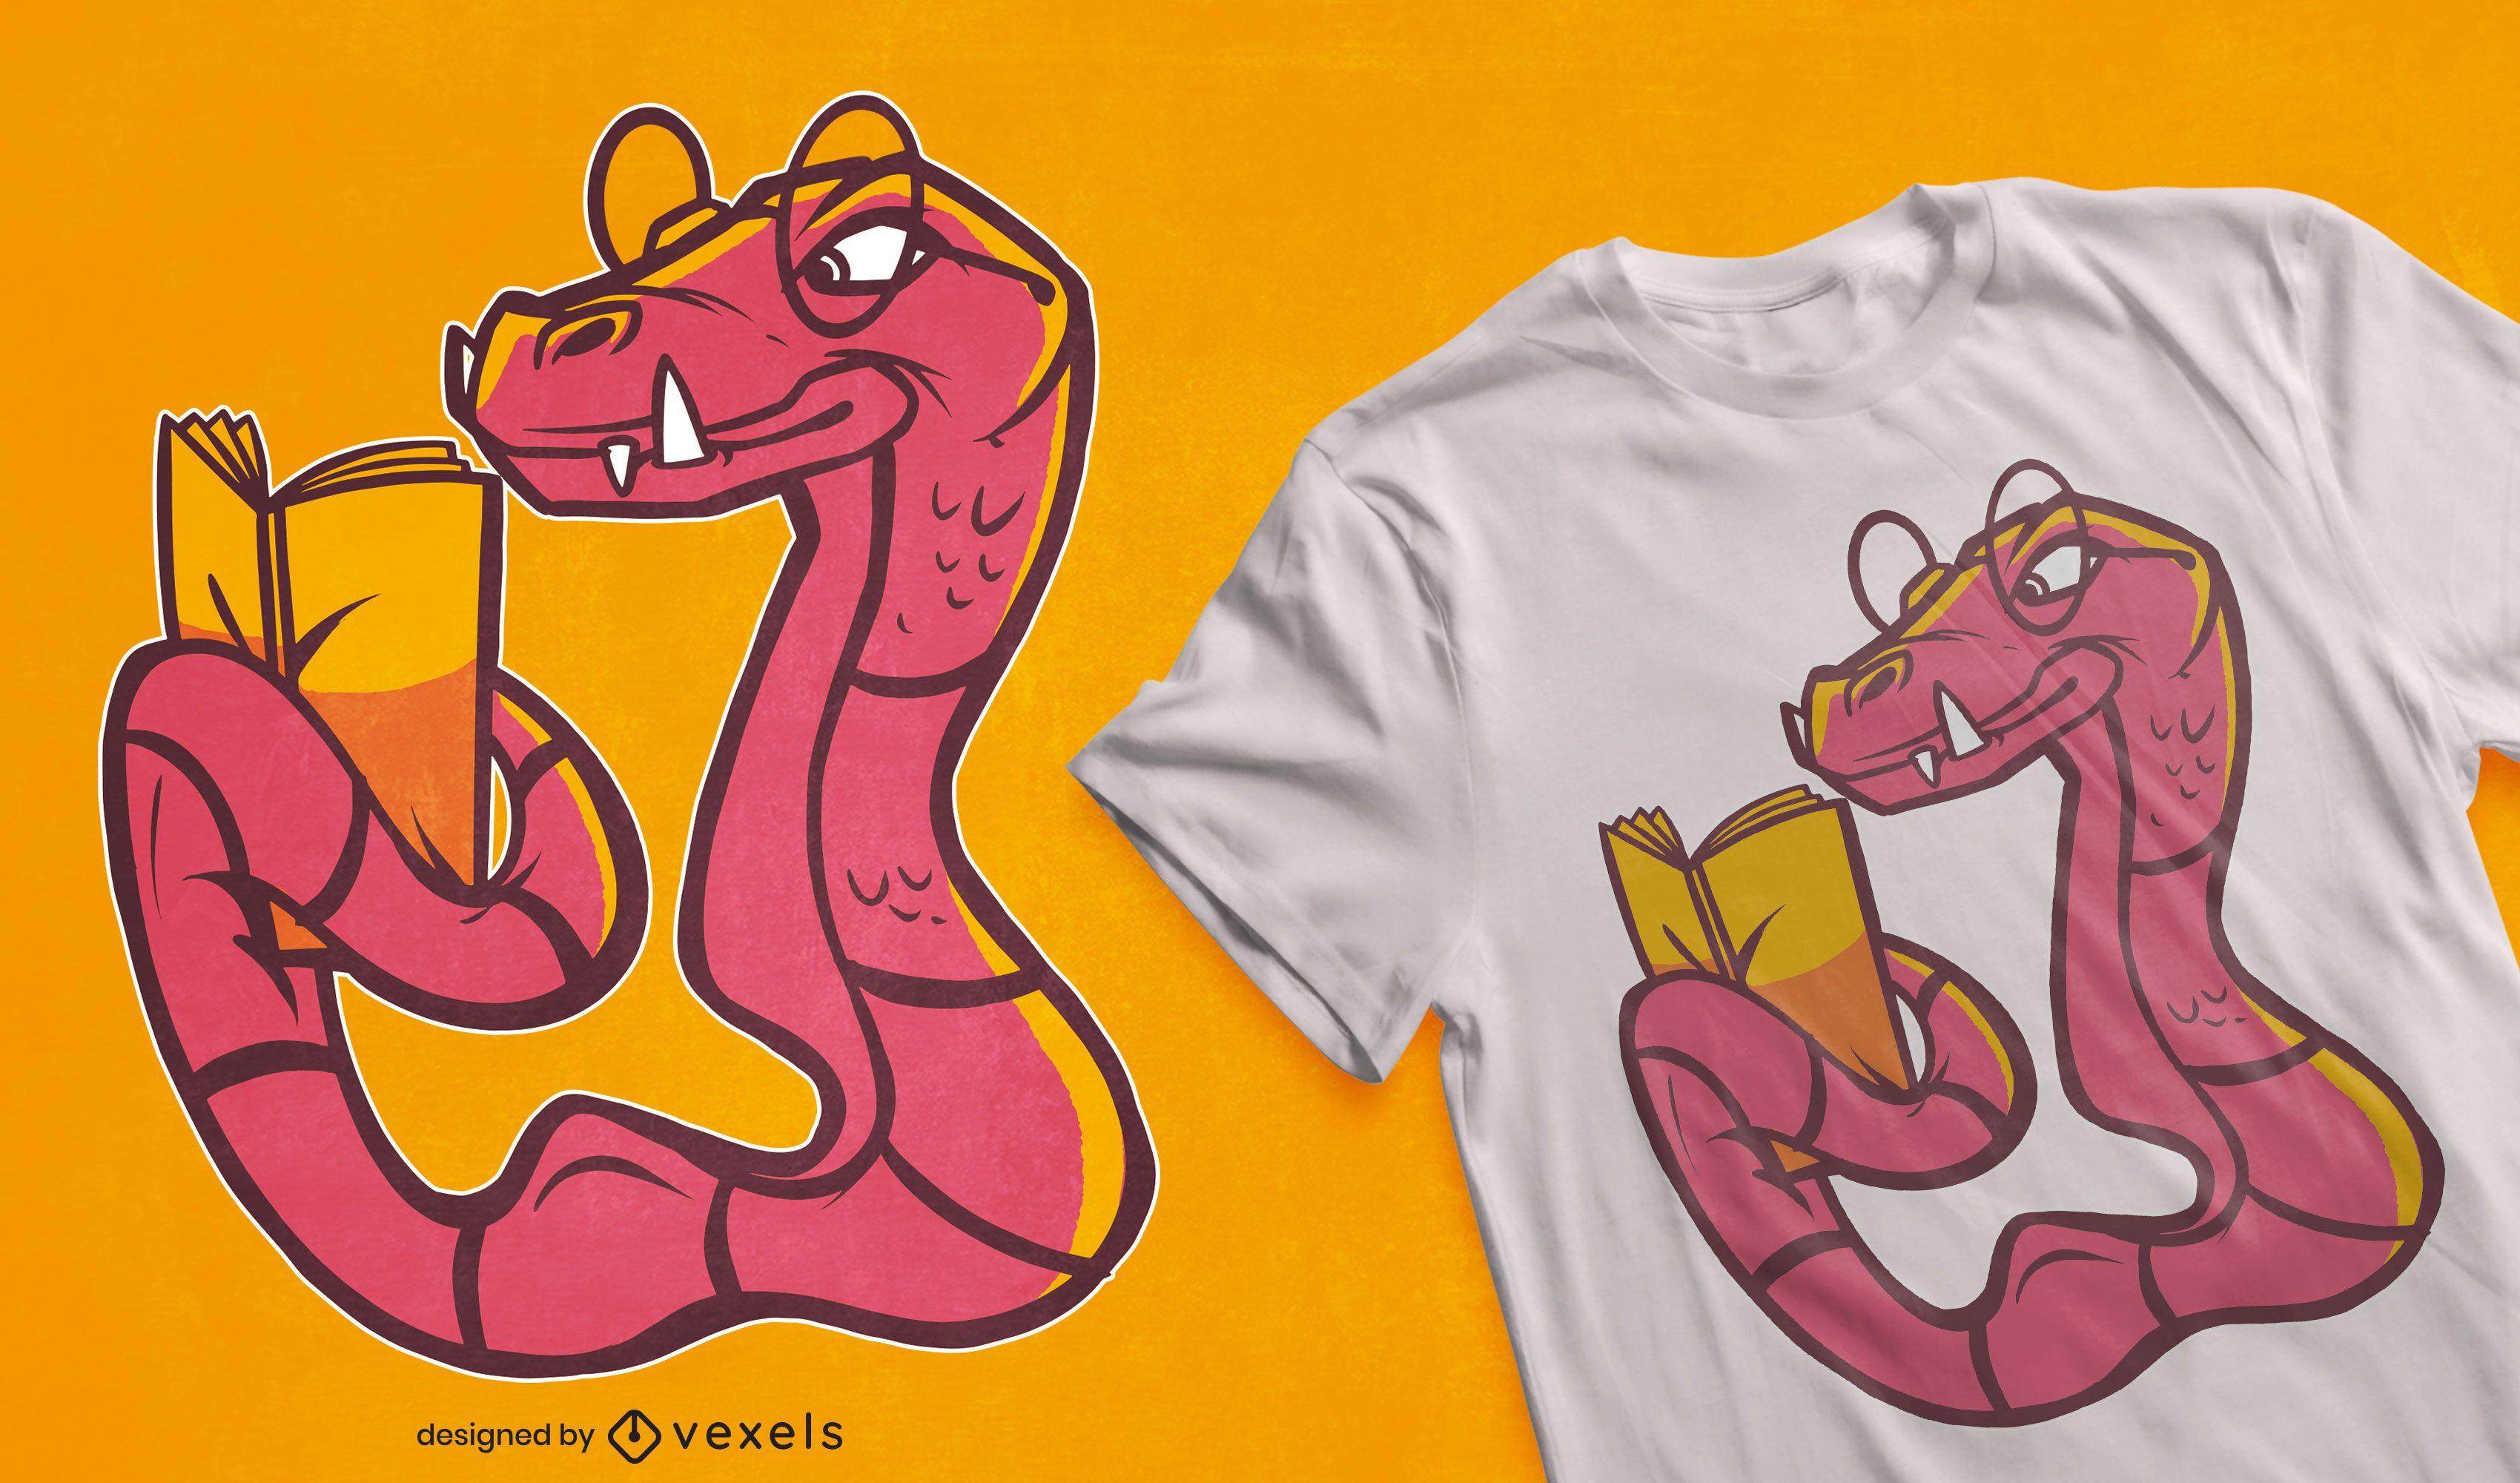 Dise?o de camiseta de dibujos animados de serpiente de lectura